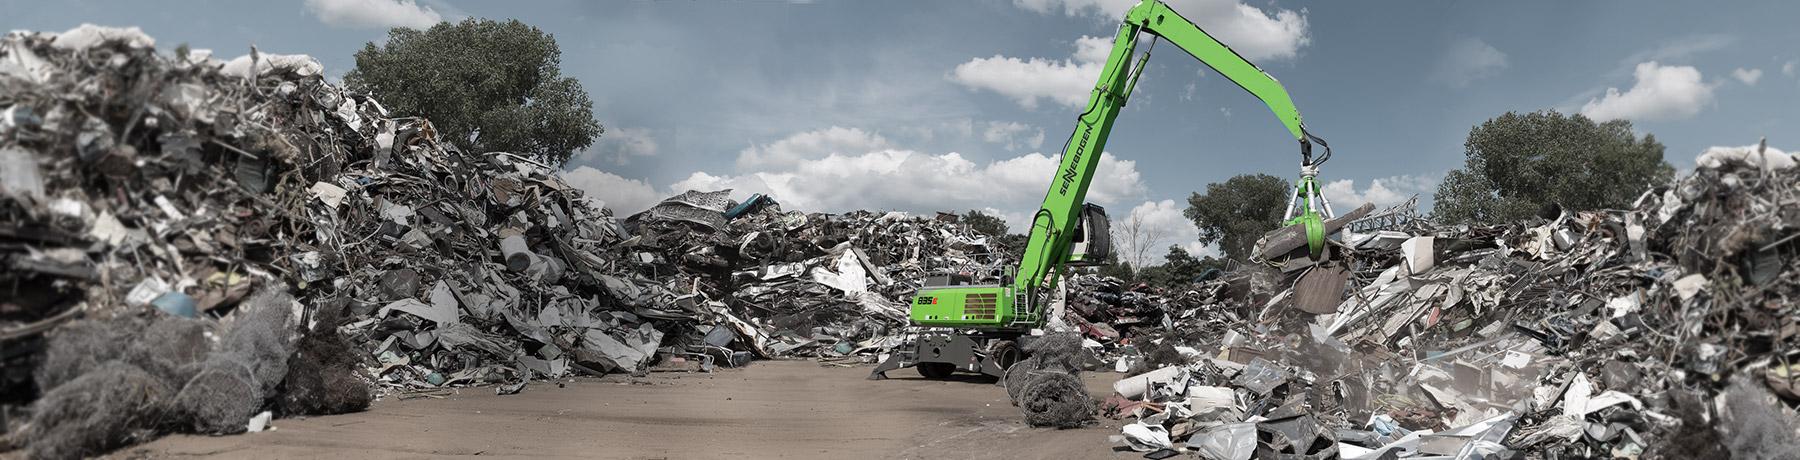 scrap-home-banner-1